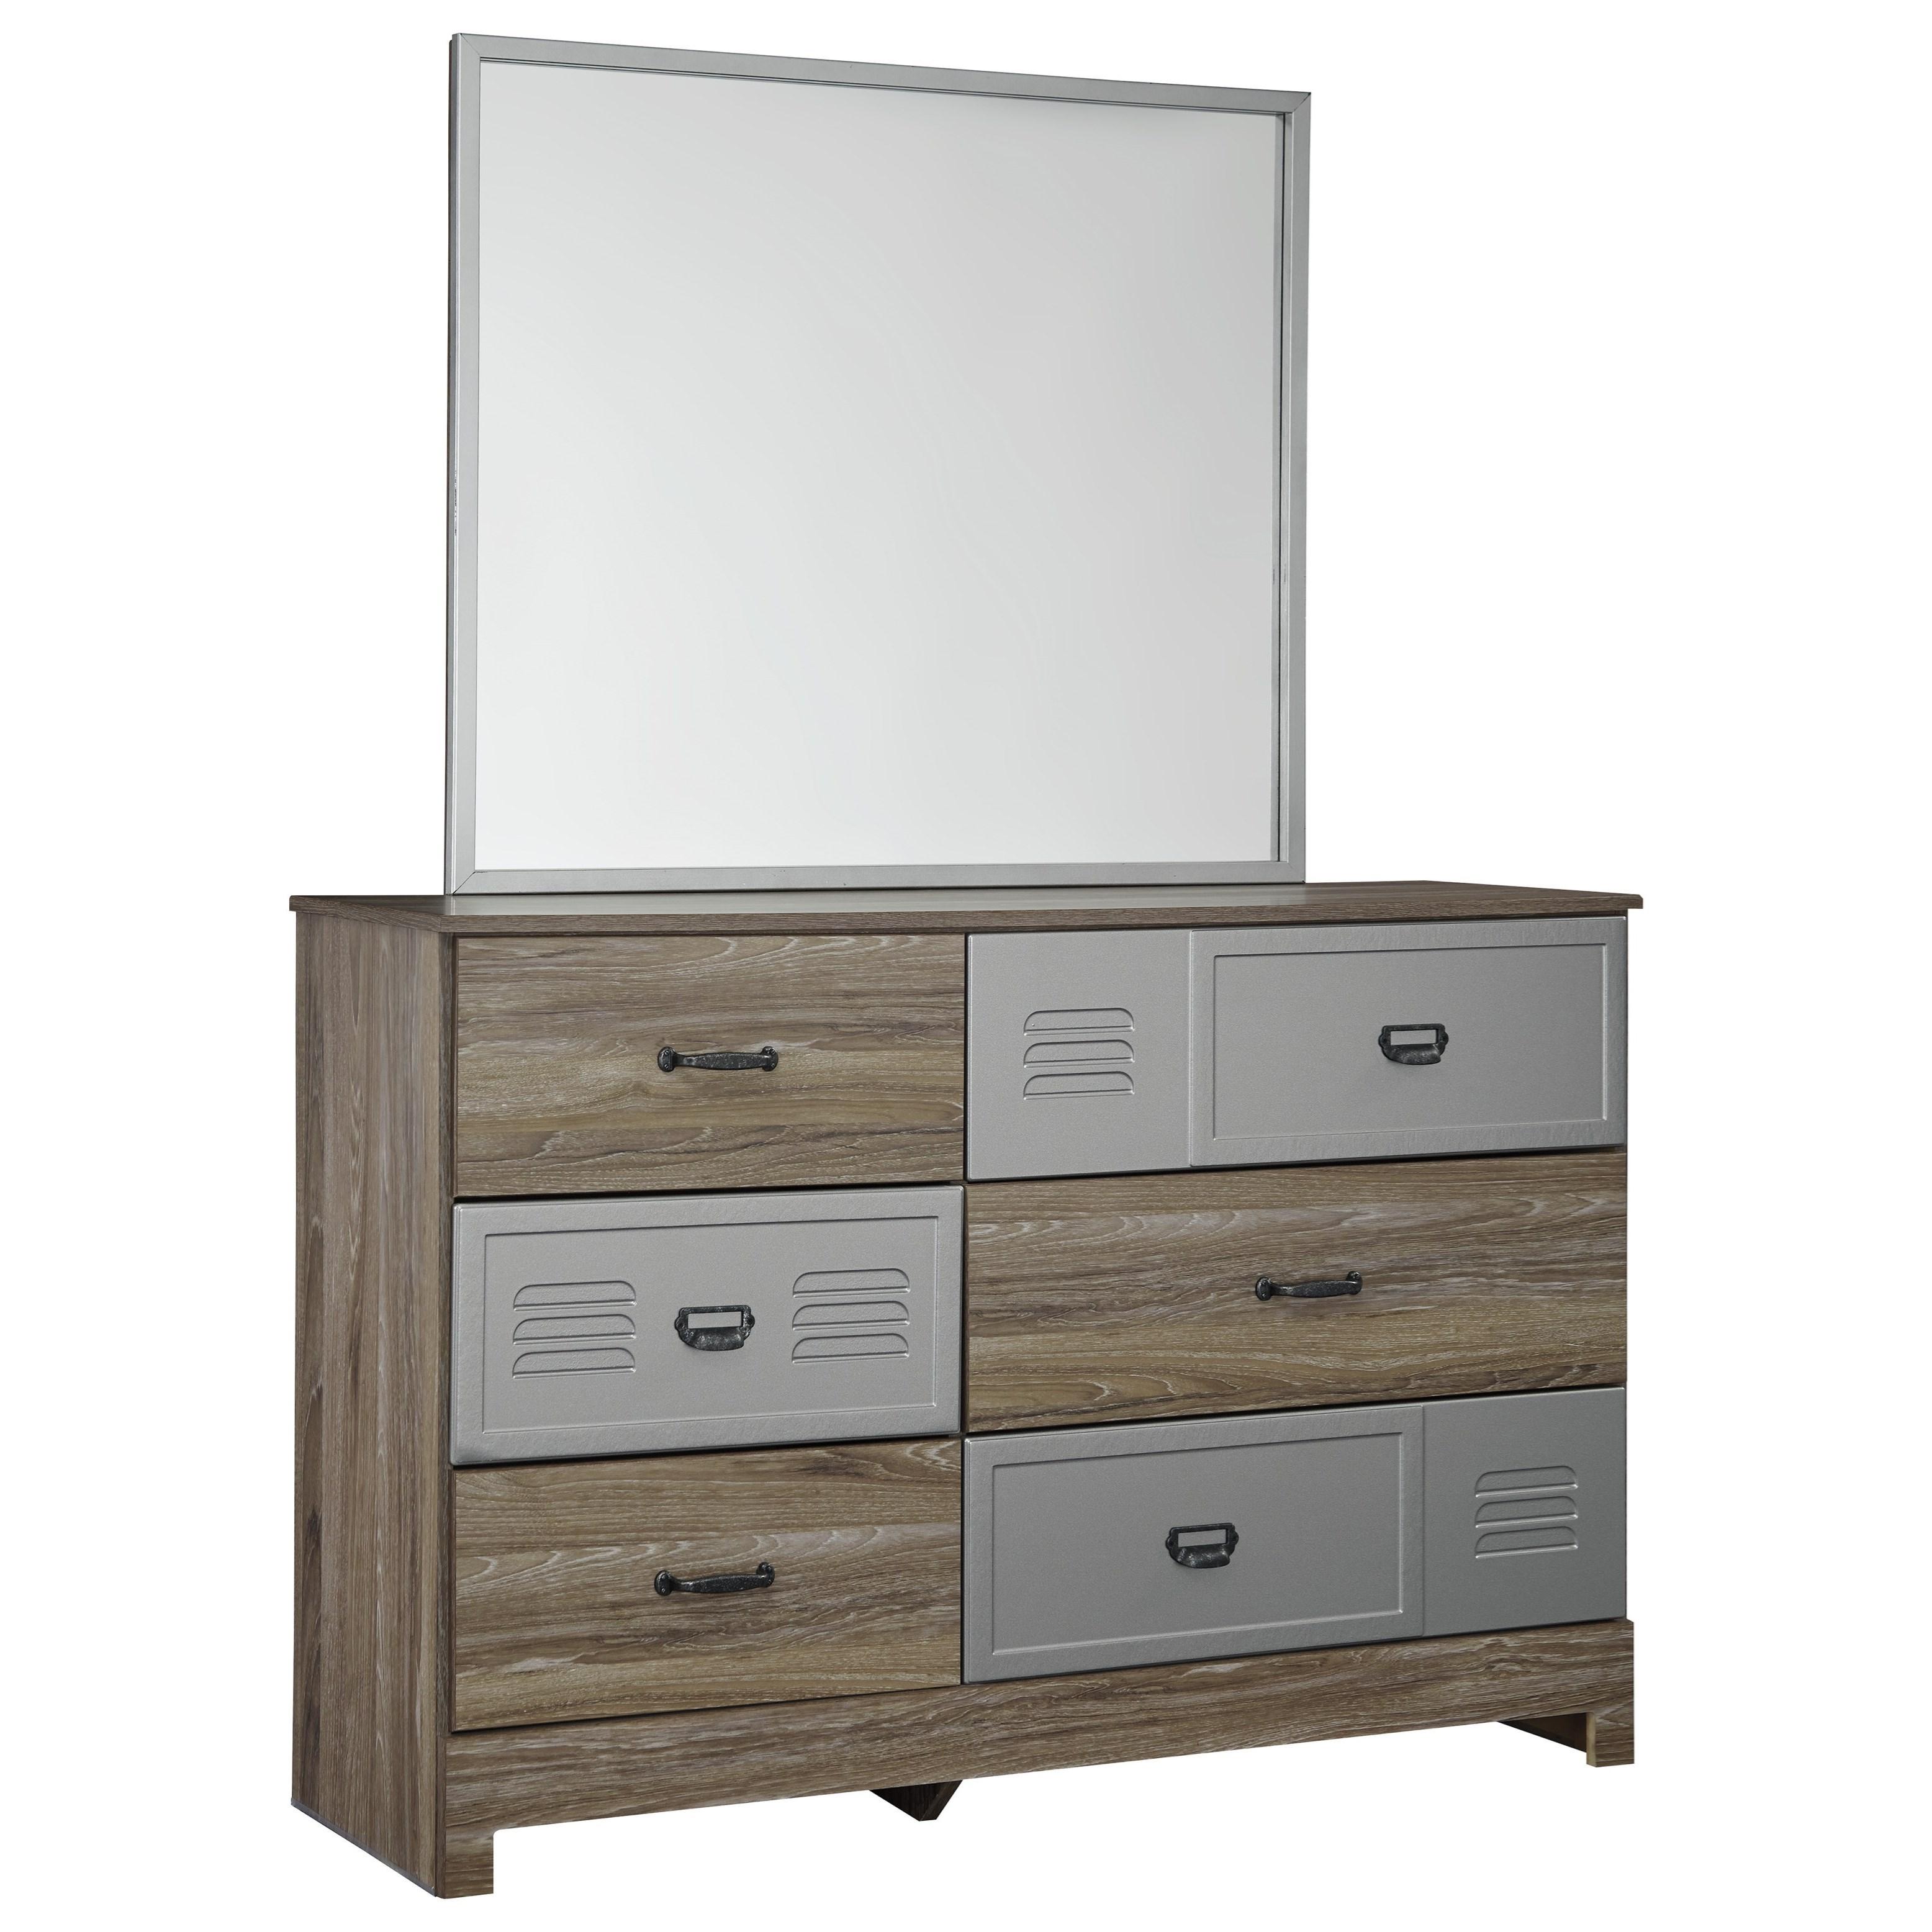 Signature Design by Ashley McKeeth Dresser & Bedroom Mirror - Item Number: B099-21+26